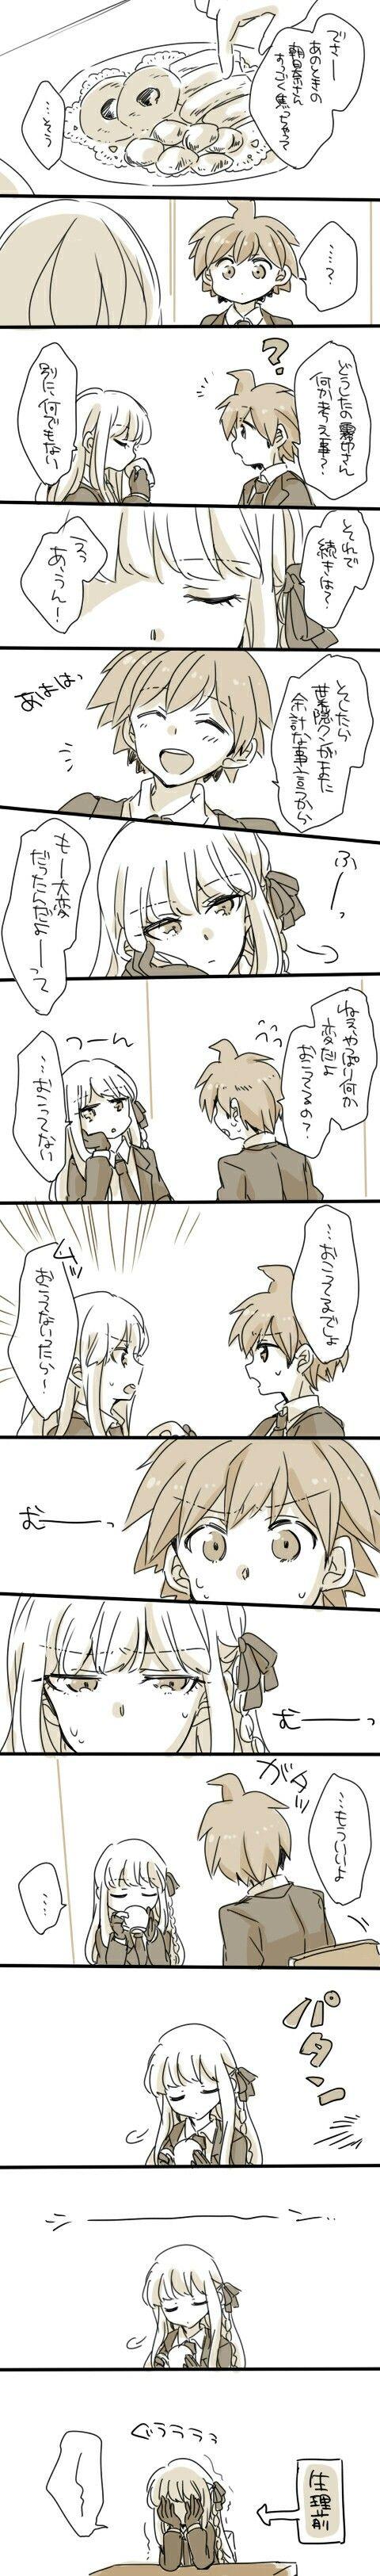 Makoto and Kyoko